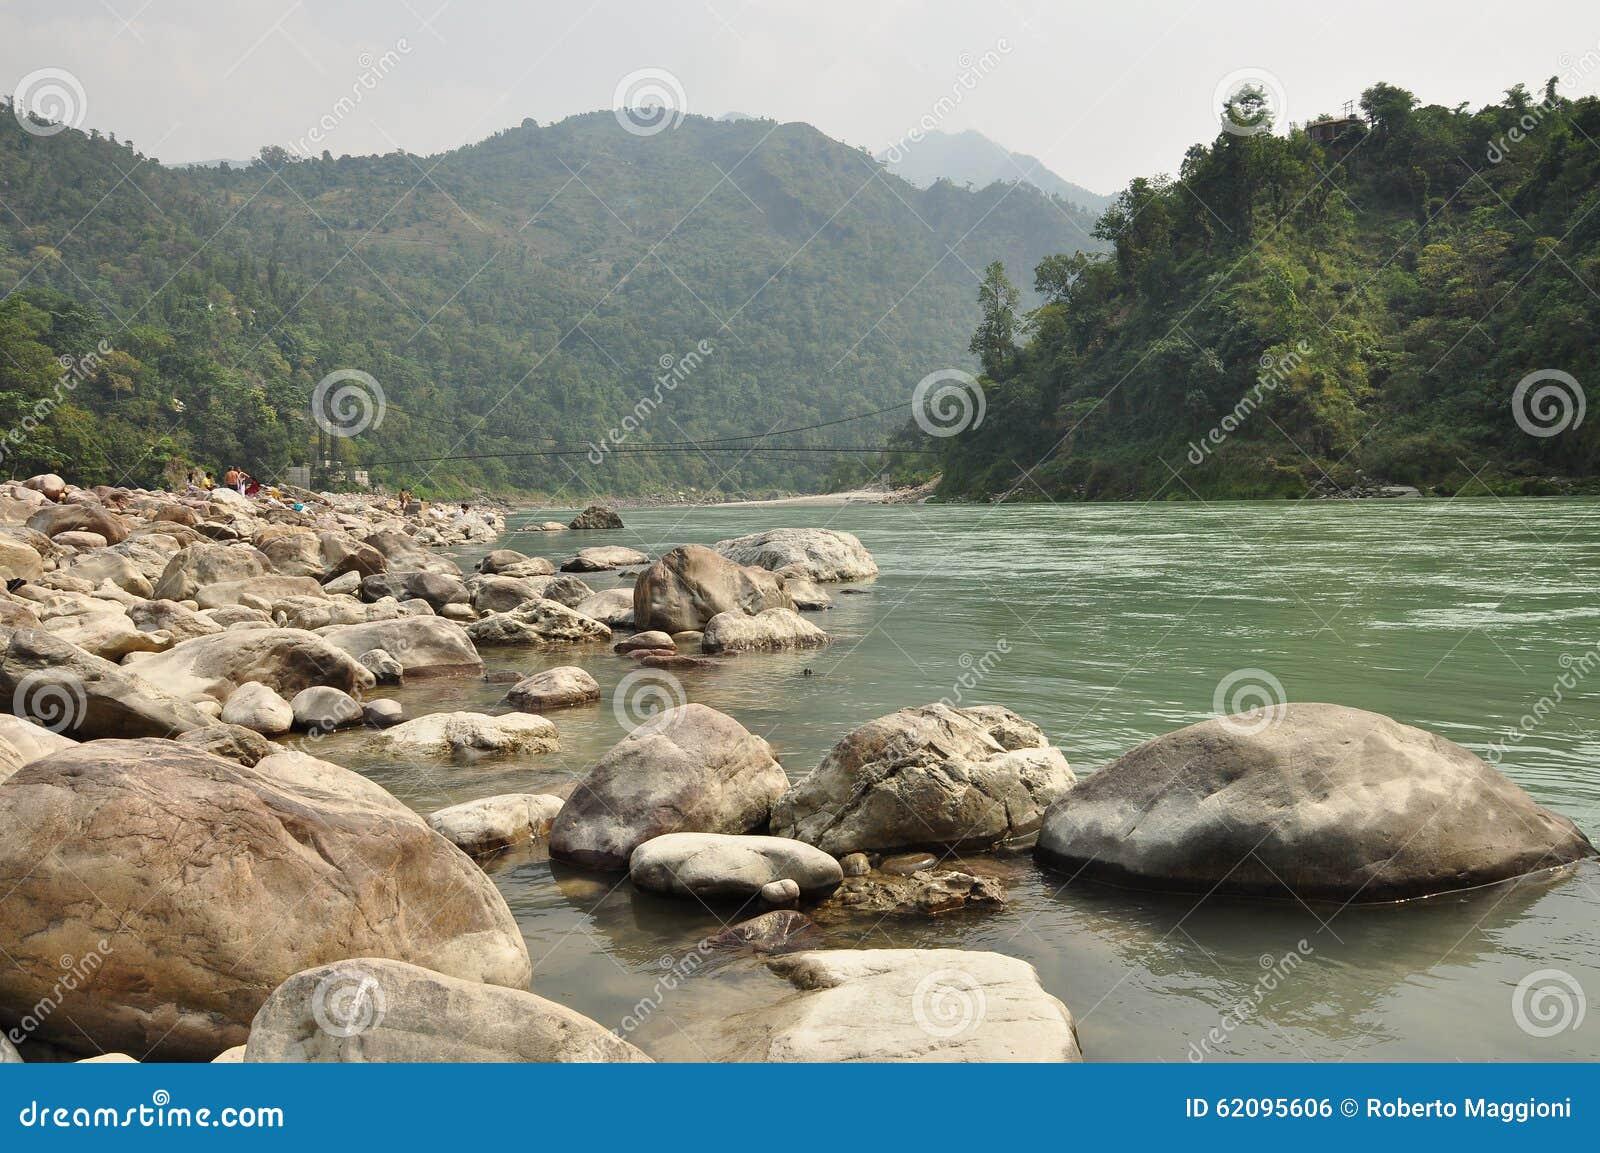 The Ganges, Indian sacred river near Rishikesh, India